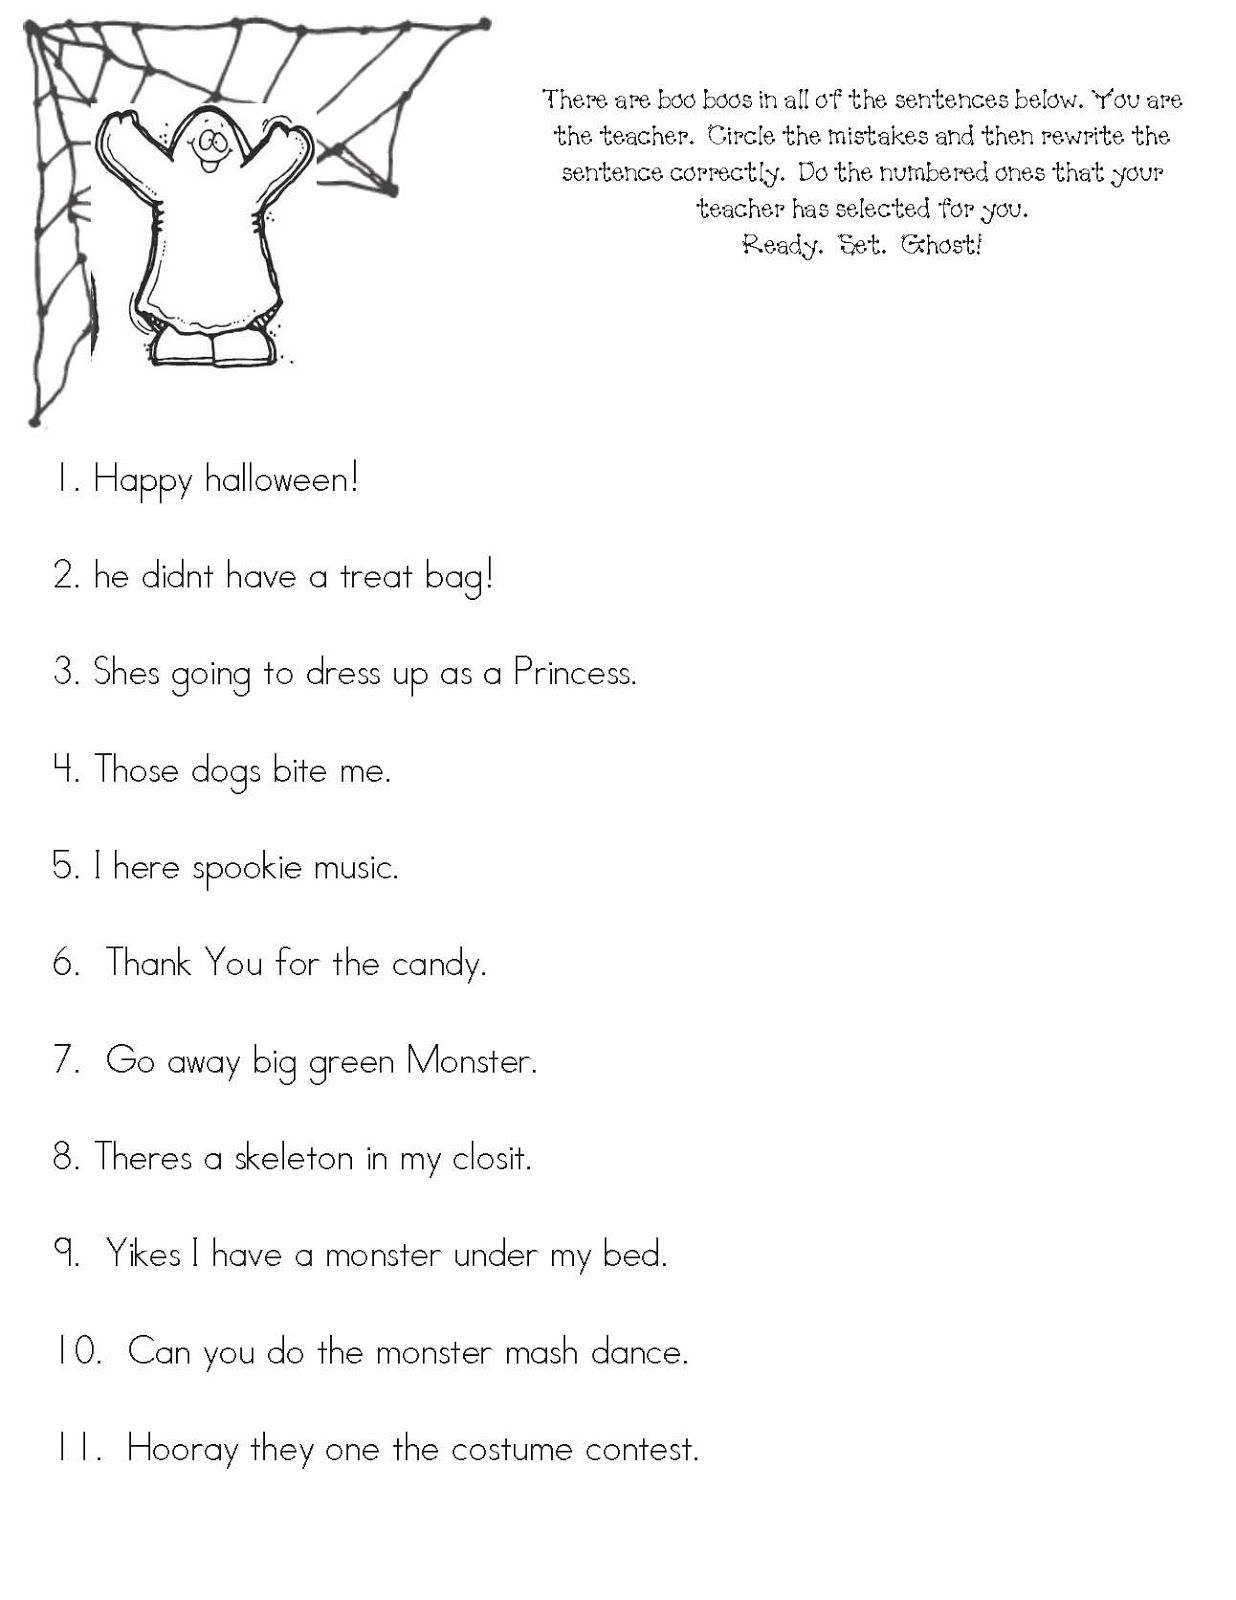 1st Grade English Worksheets Best Coloring Pages For Kids English Worksheets For Kindergarten Kindergarten English Comprehension Worksheets [ 1035 x 800 Pixel ]